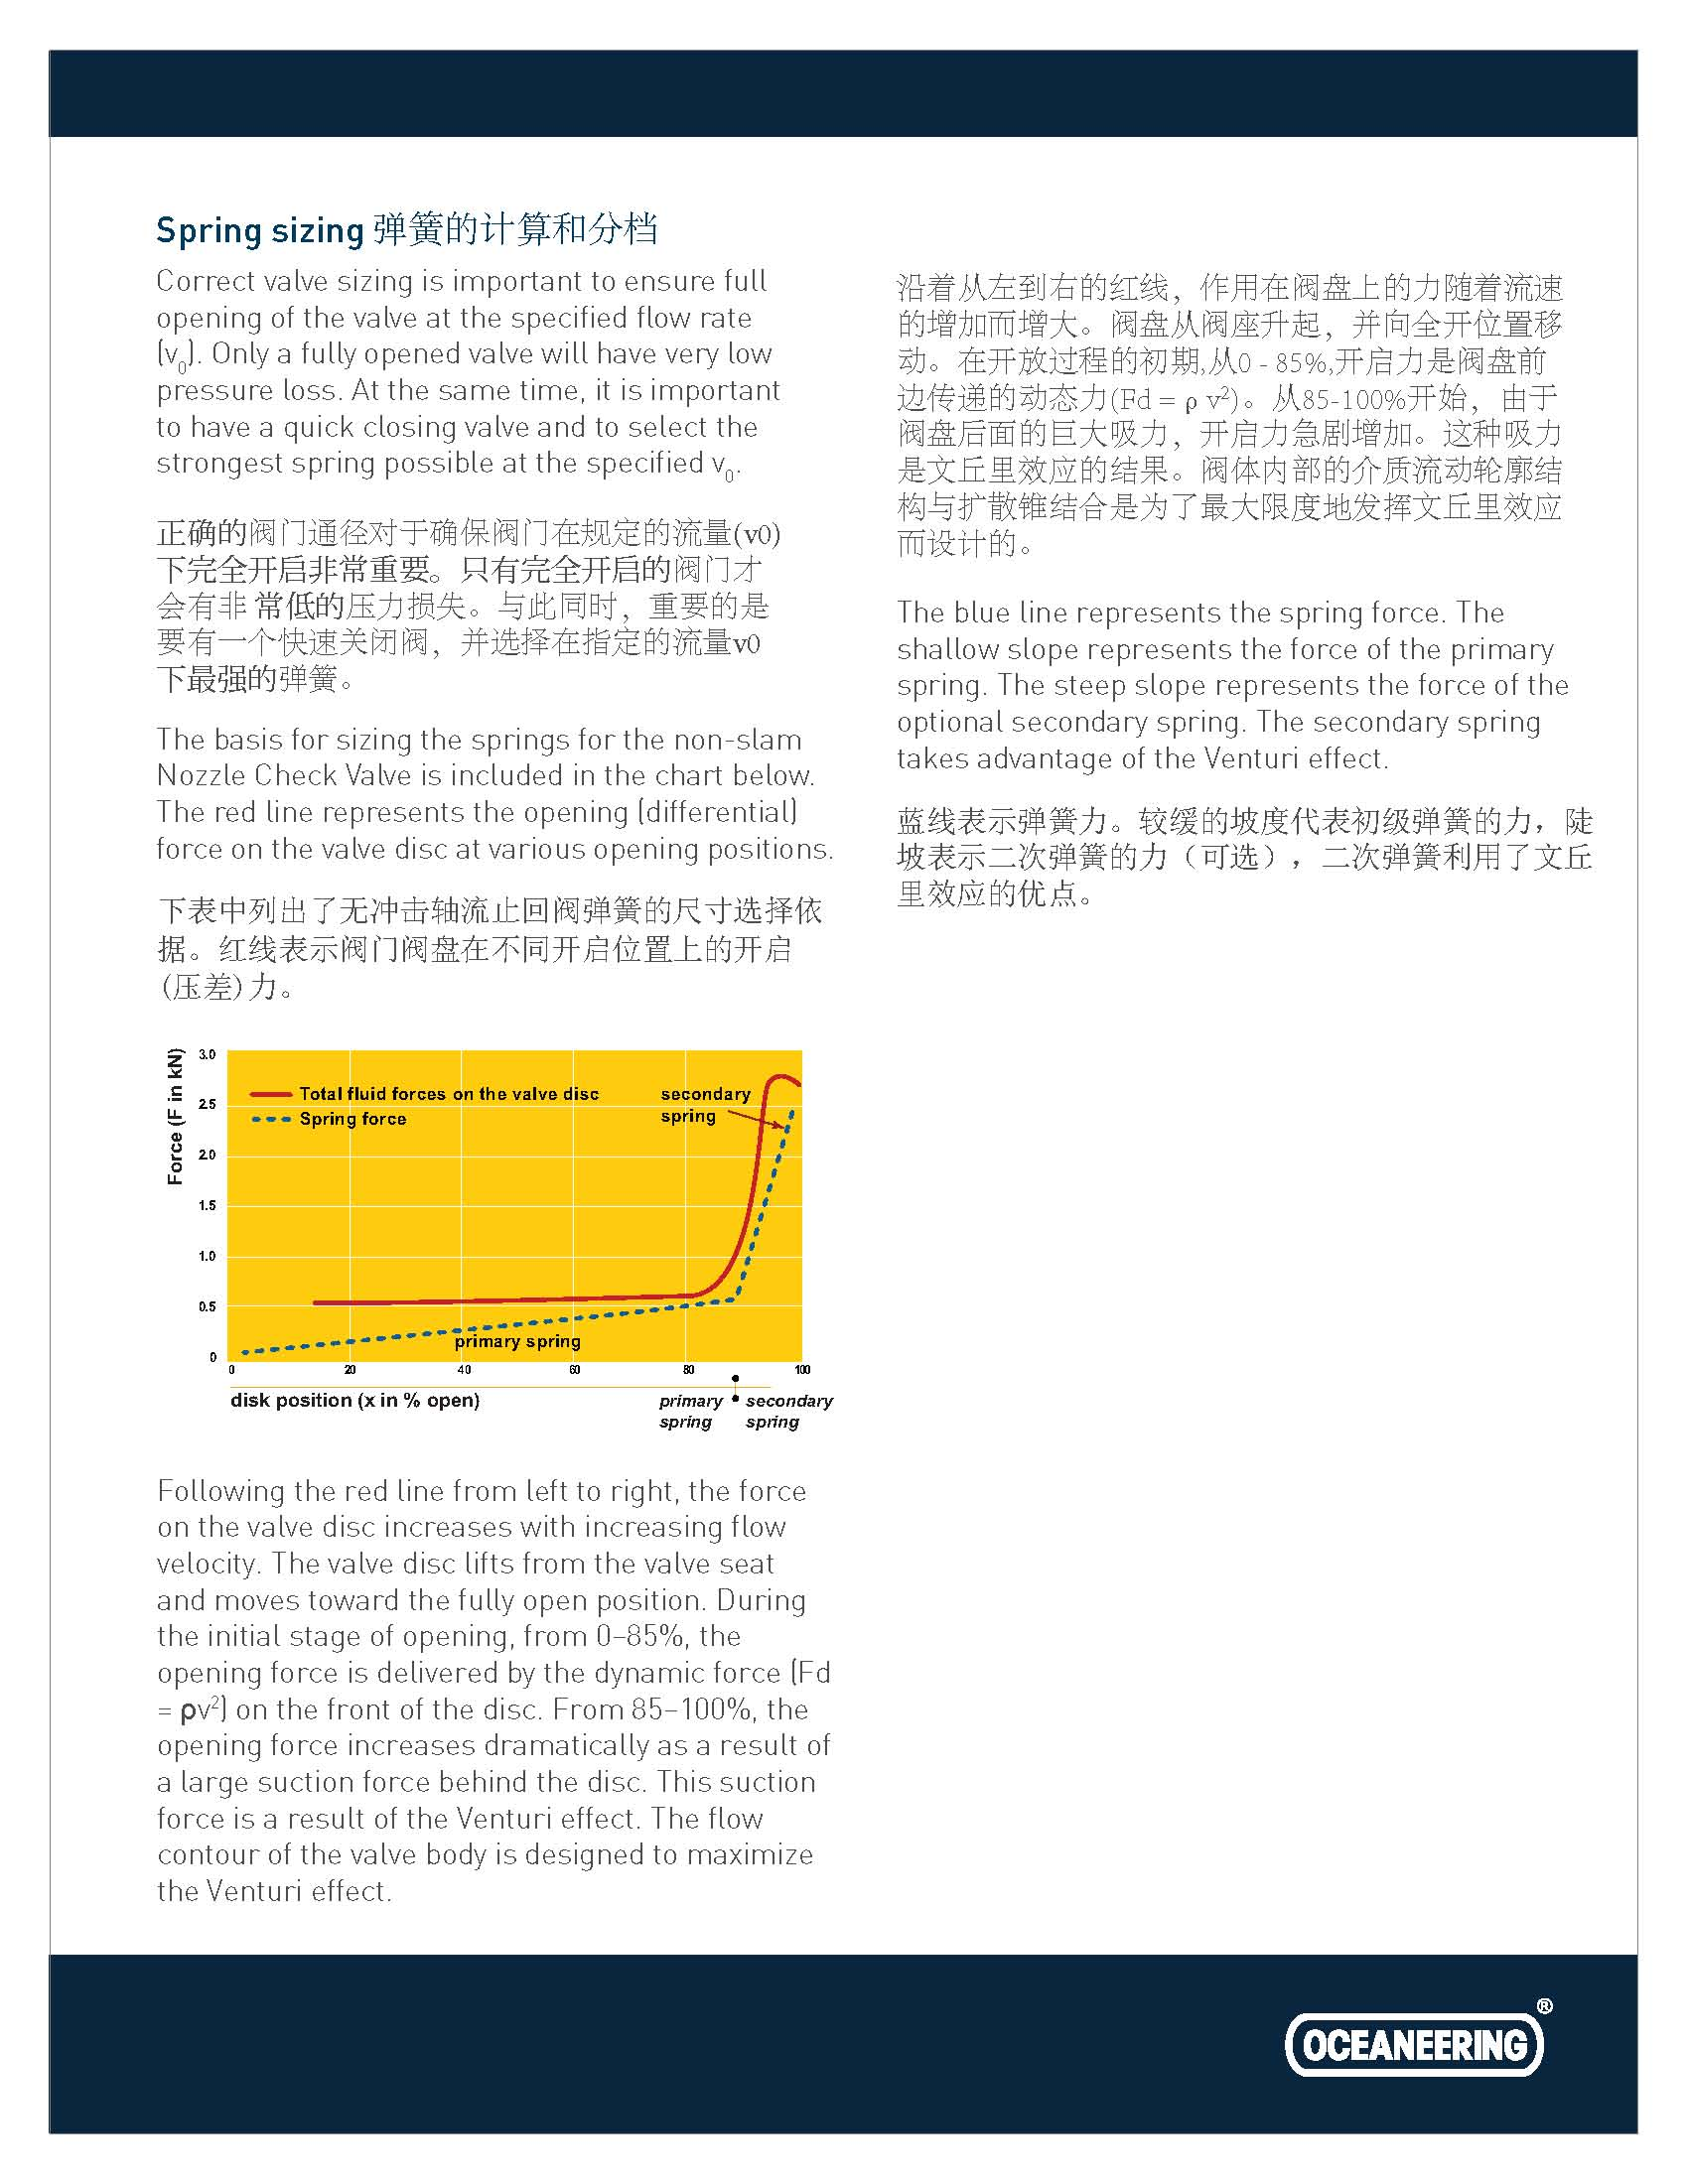 12Catalog-GraylocNozzleCheckValve-Chinese_页面_07